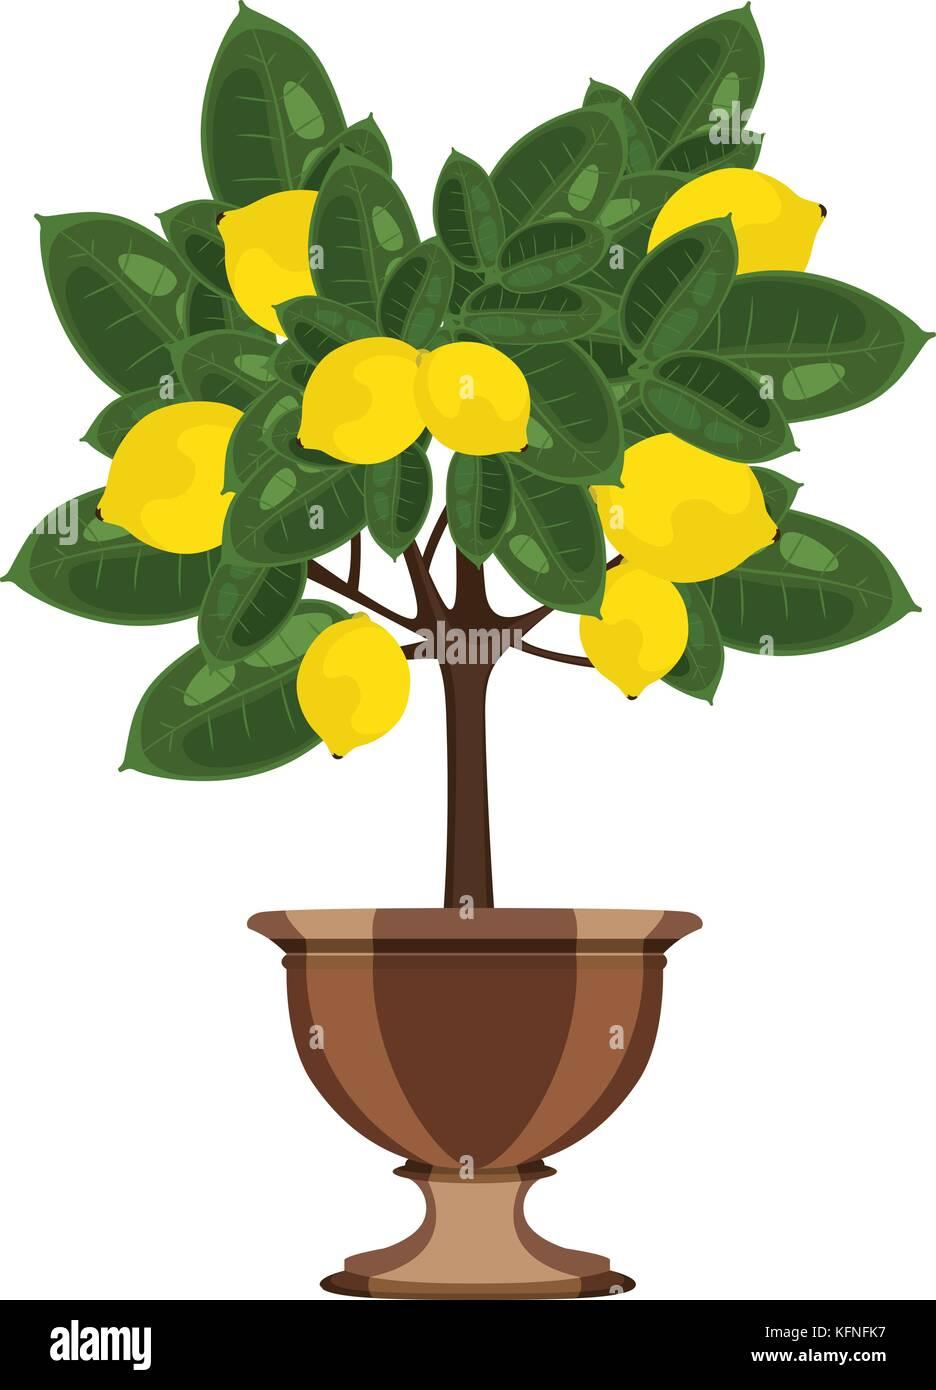 Lemon tree in a flowerpot vector illustration - Stock Vector